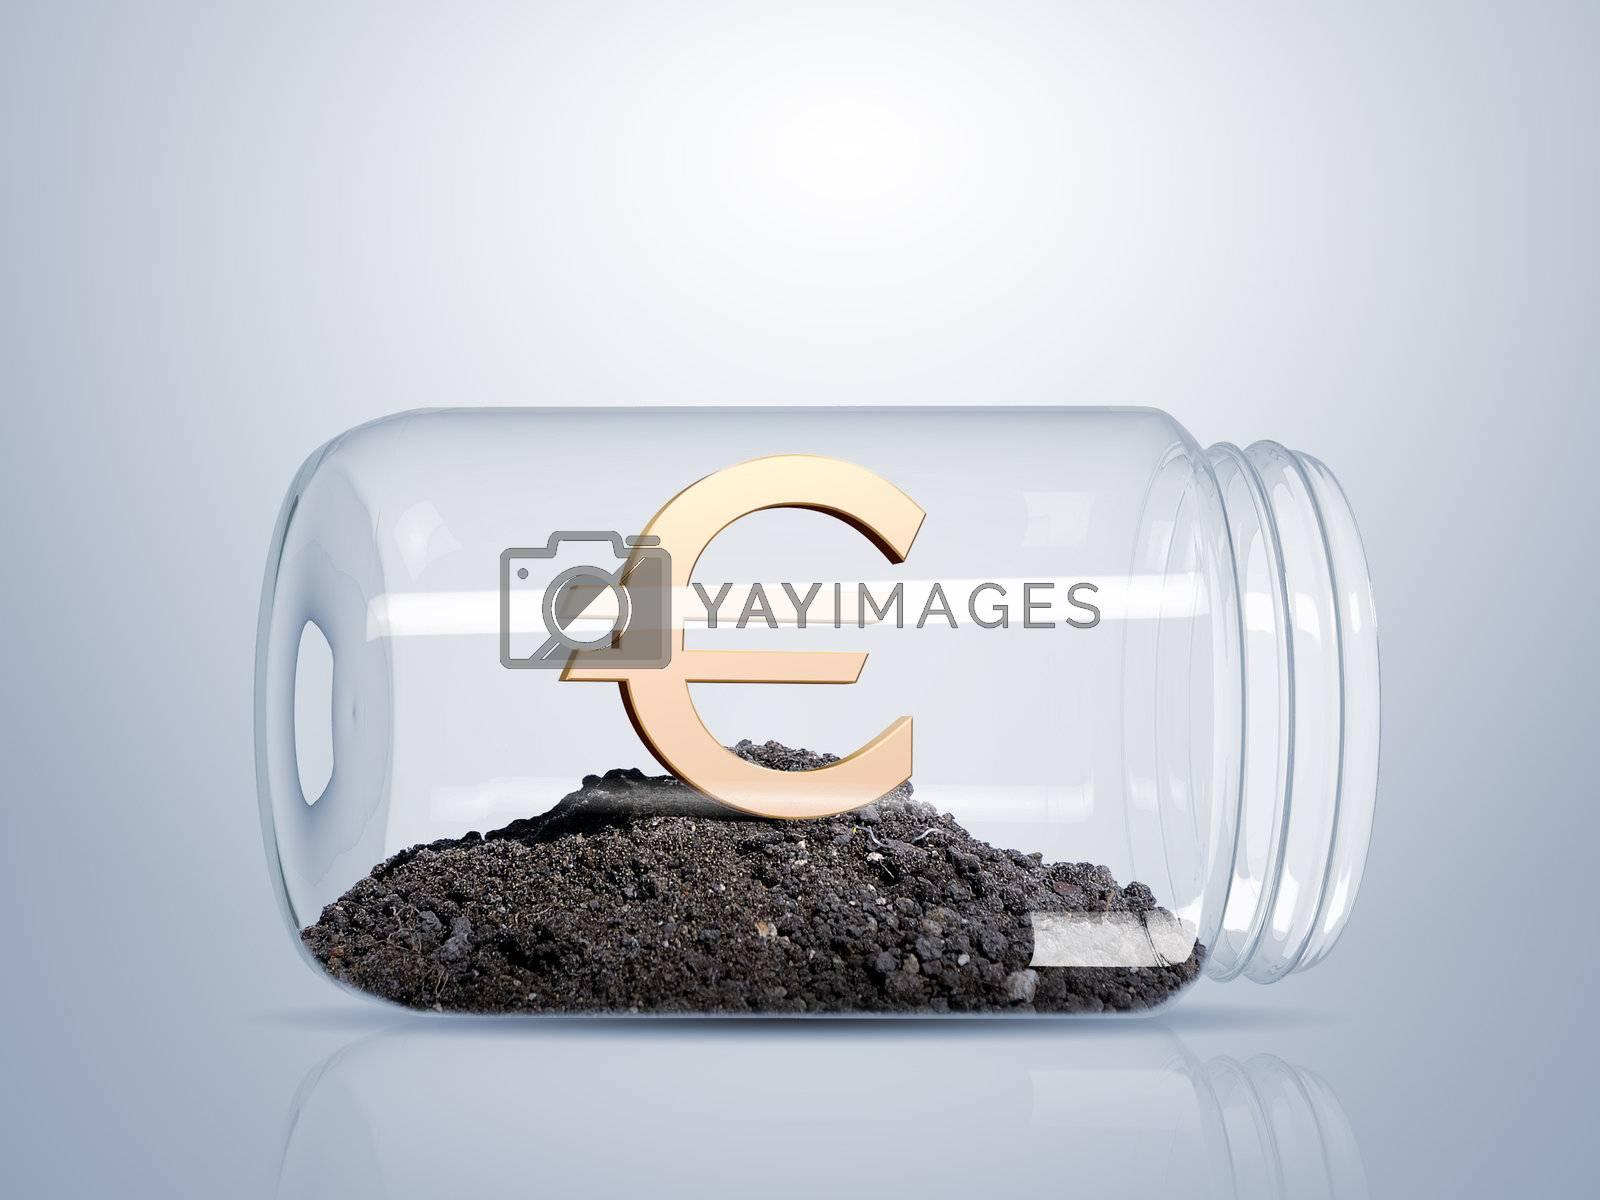 Transparent glass jar with money inside it